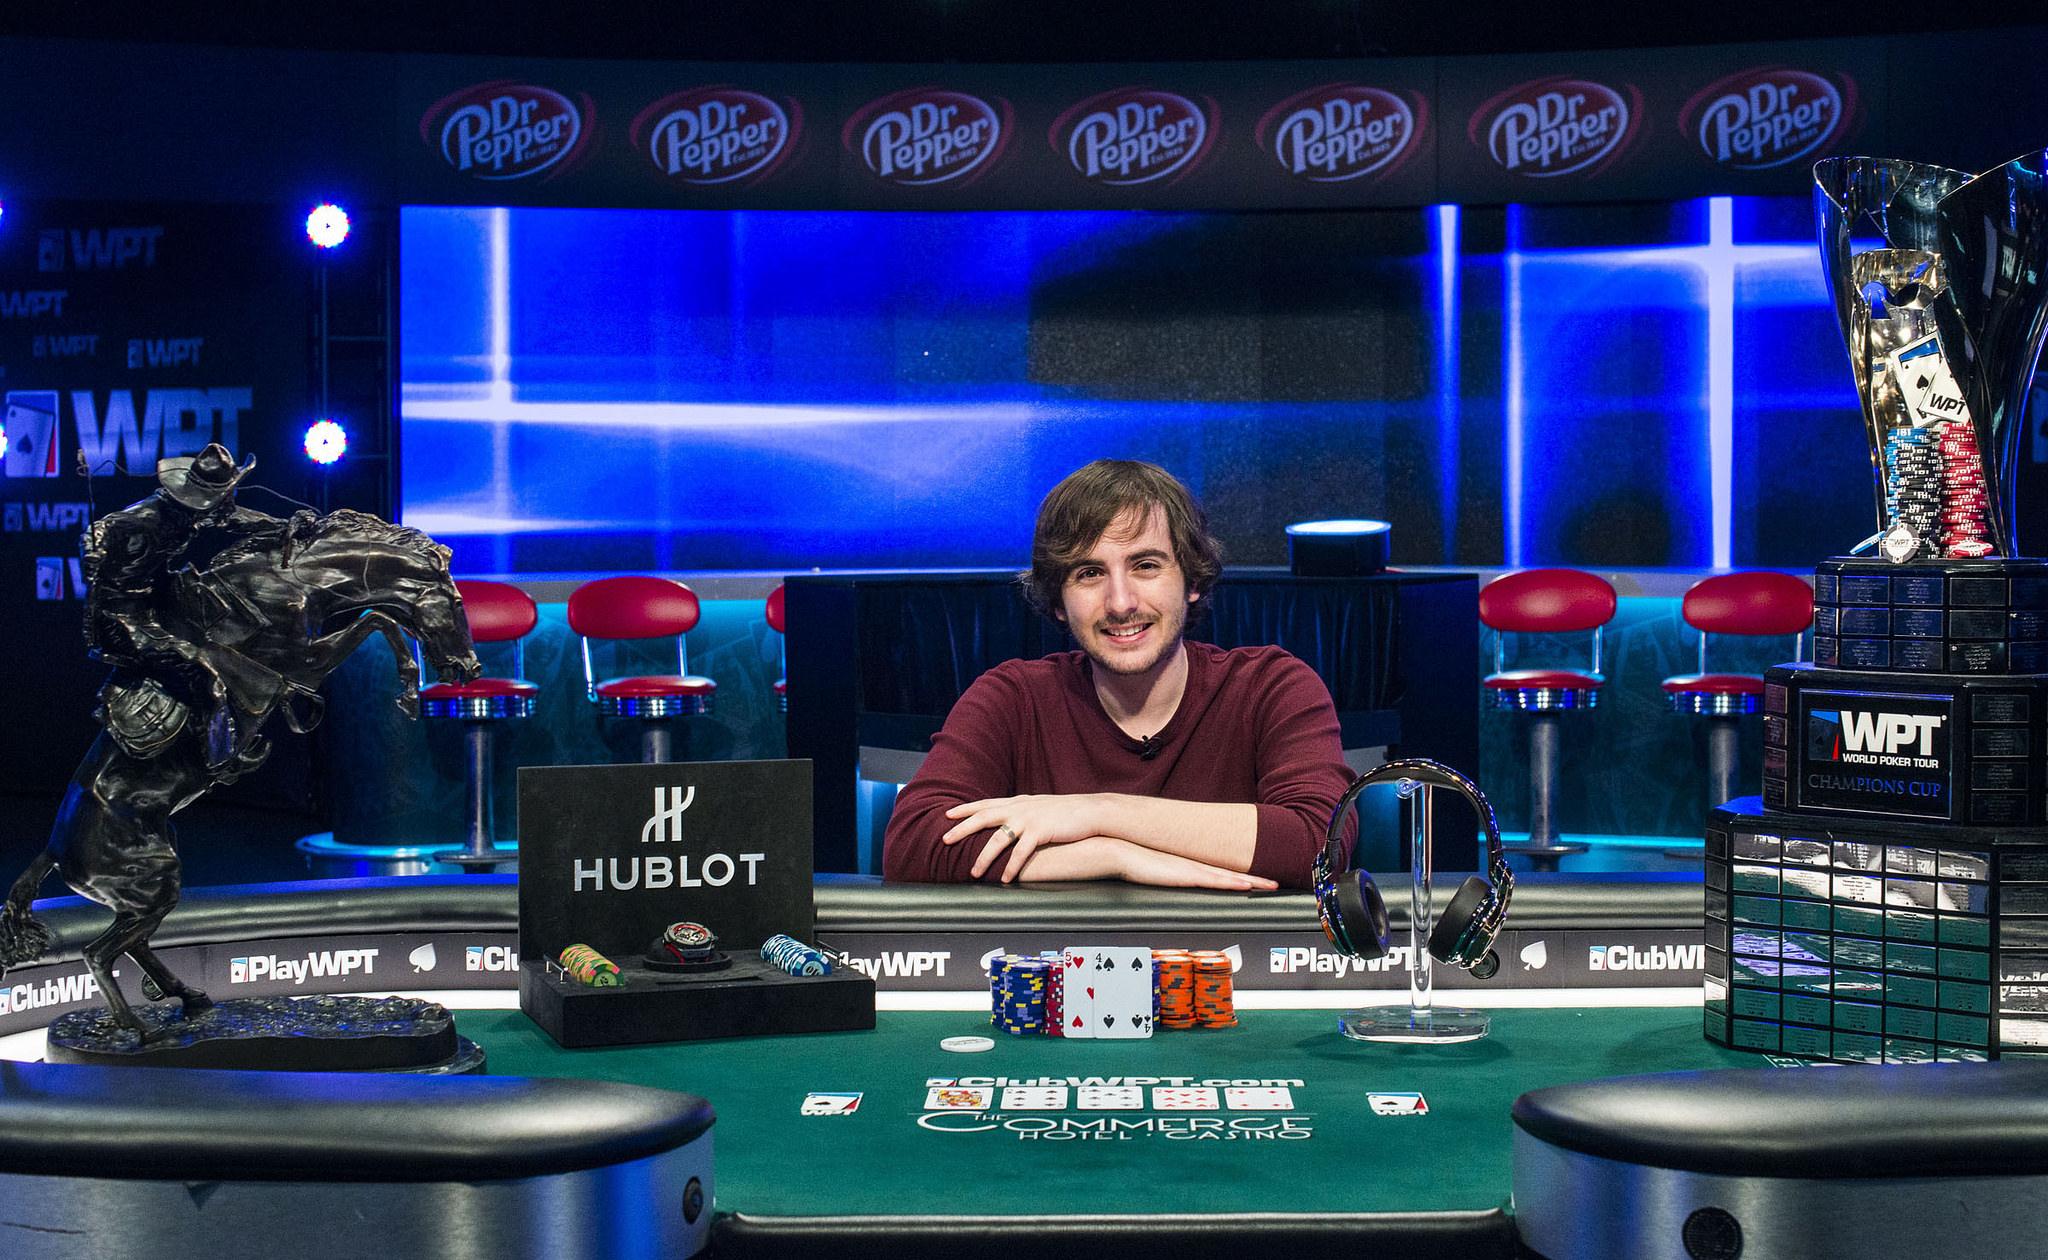 World poker tour on tv tonight casino slots news